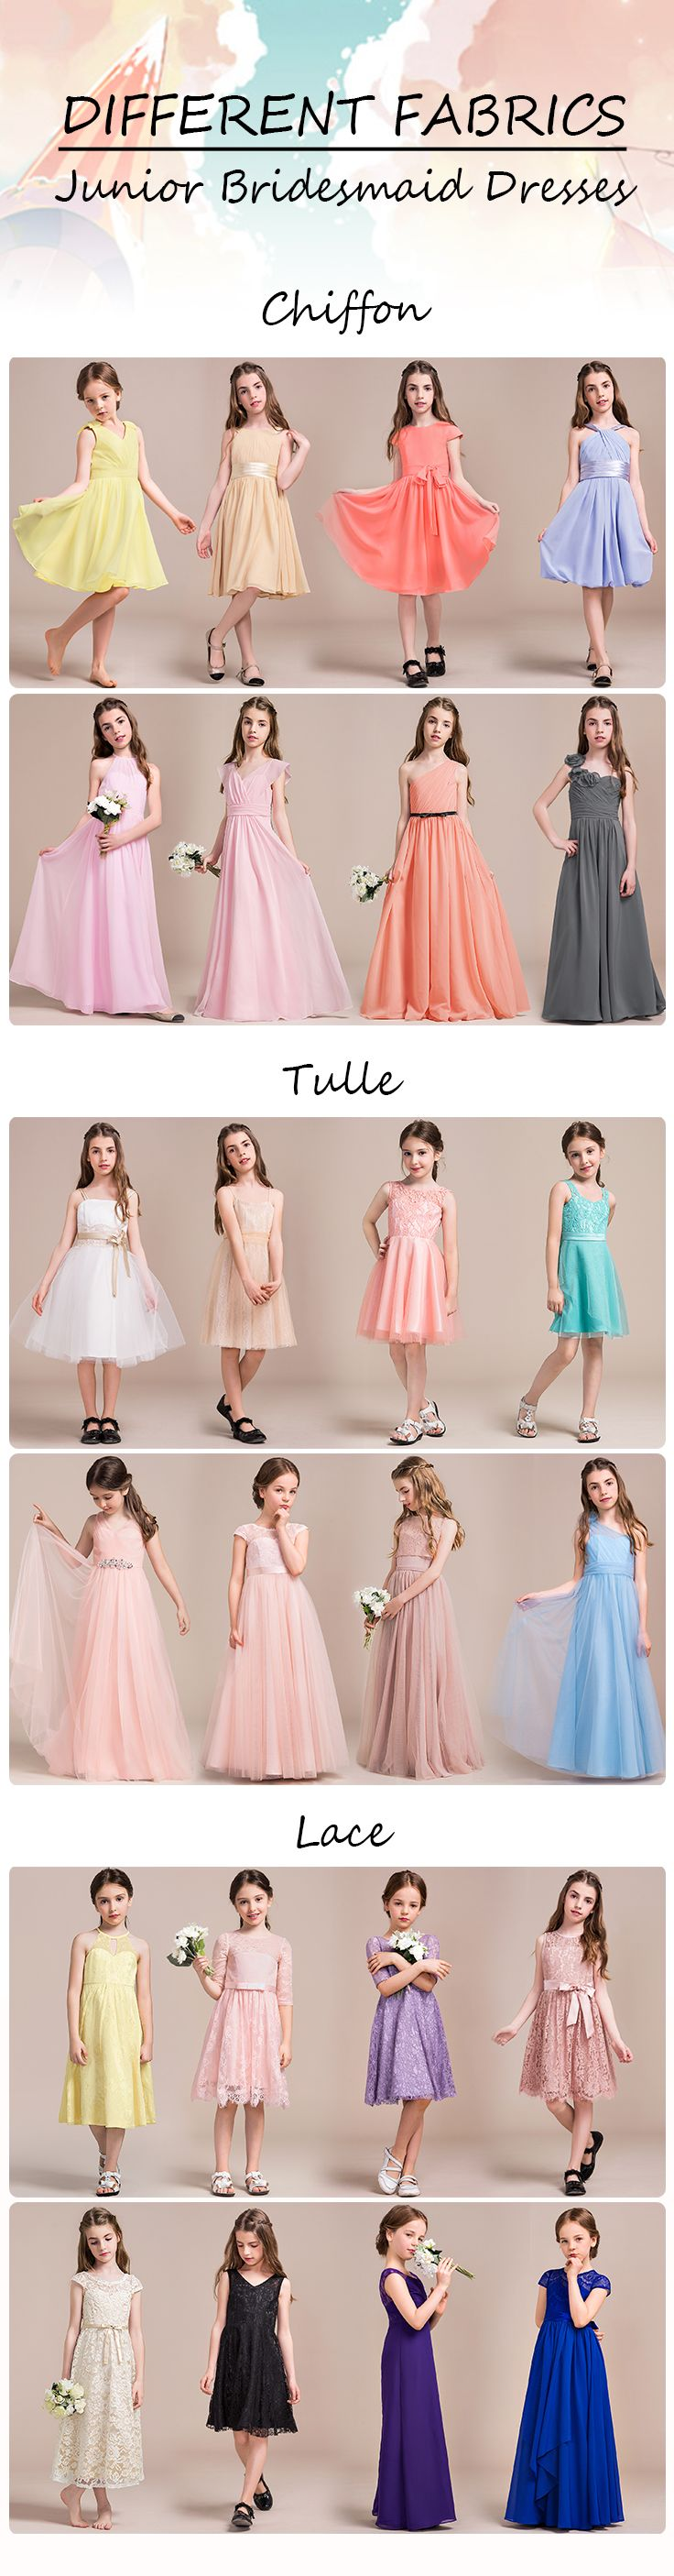 Best 25 junior bridesmaid dresses ideas on pinterest junior different fabrics junior bridesmaid dresses juniorbridesmaiddress ombrellifo Images